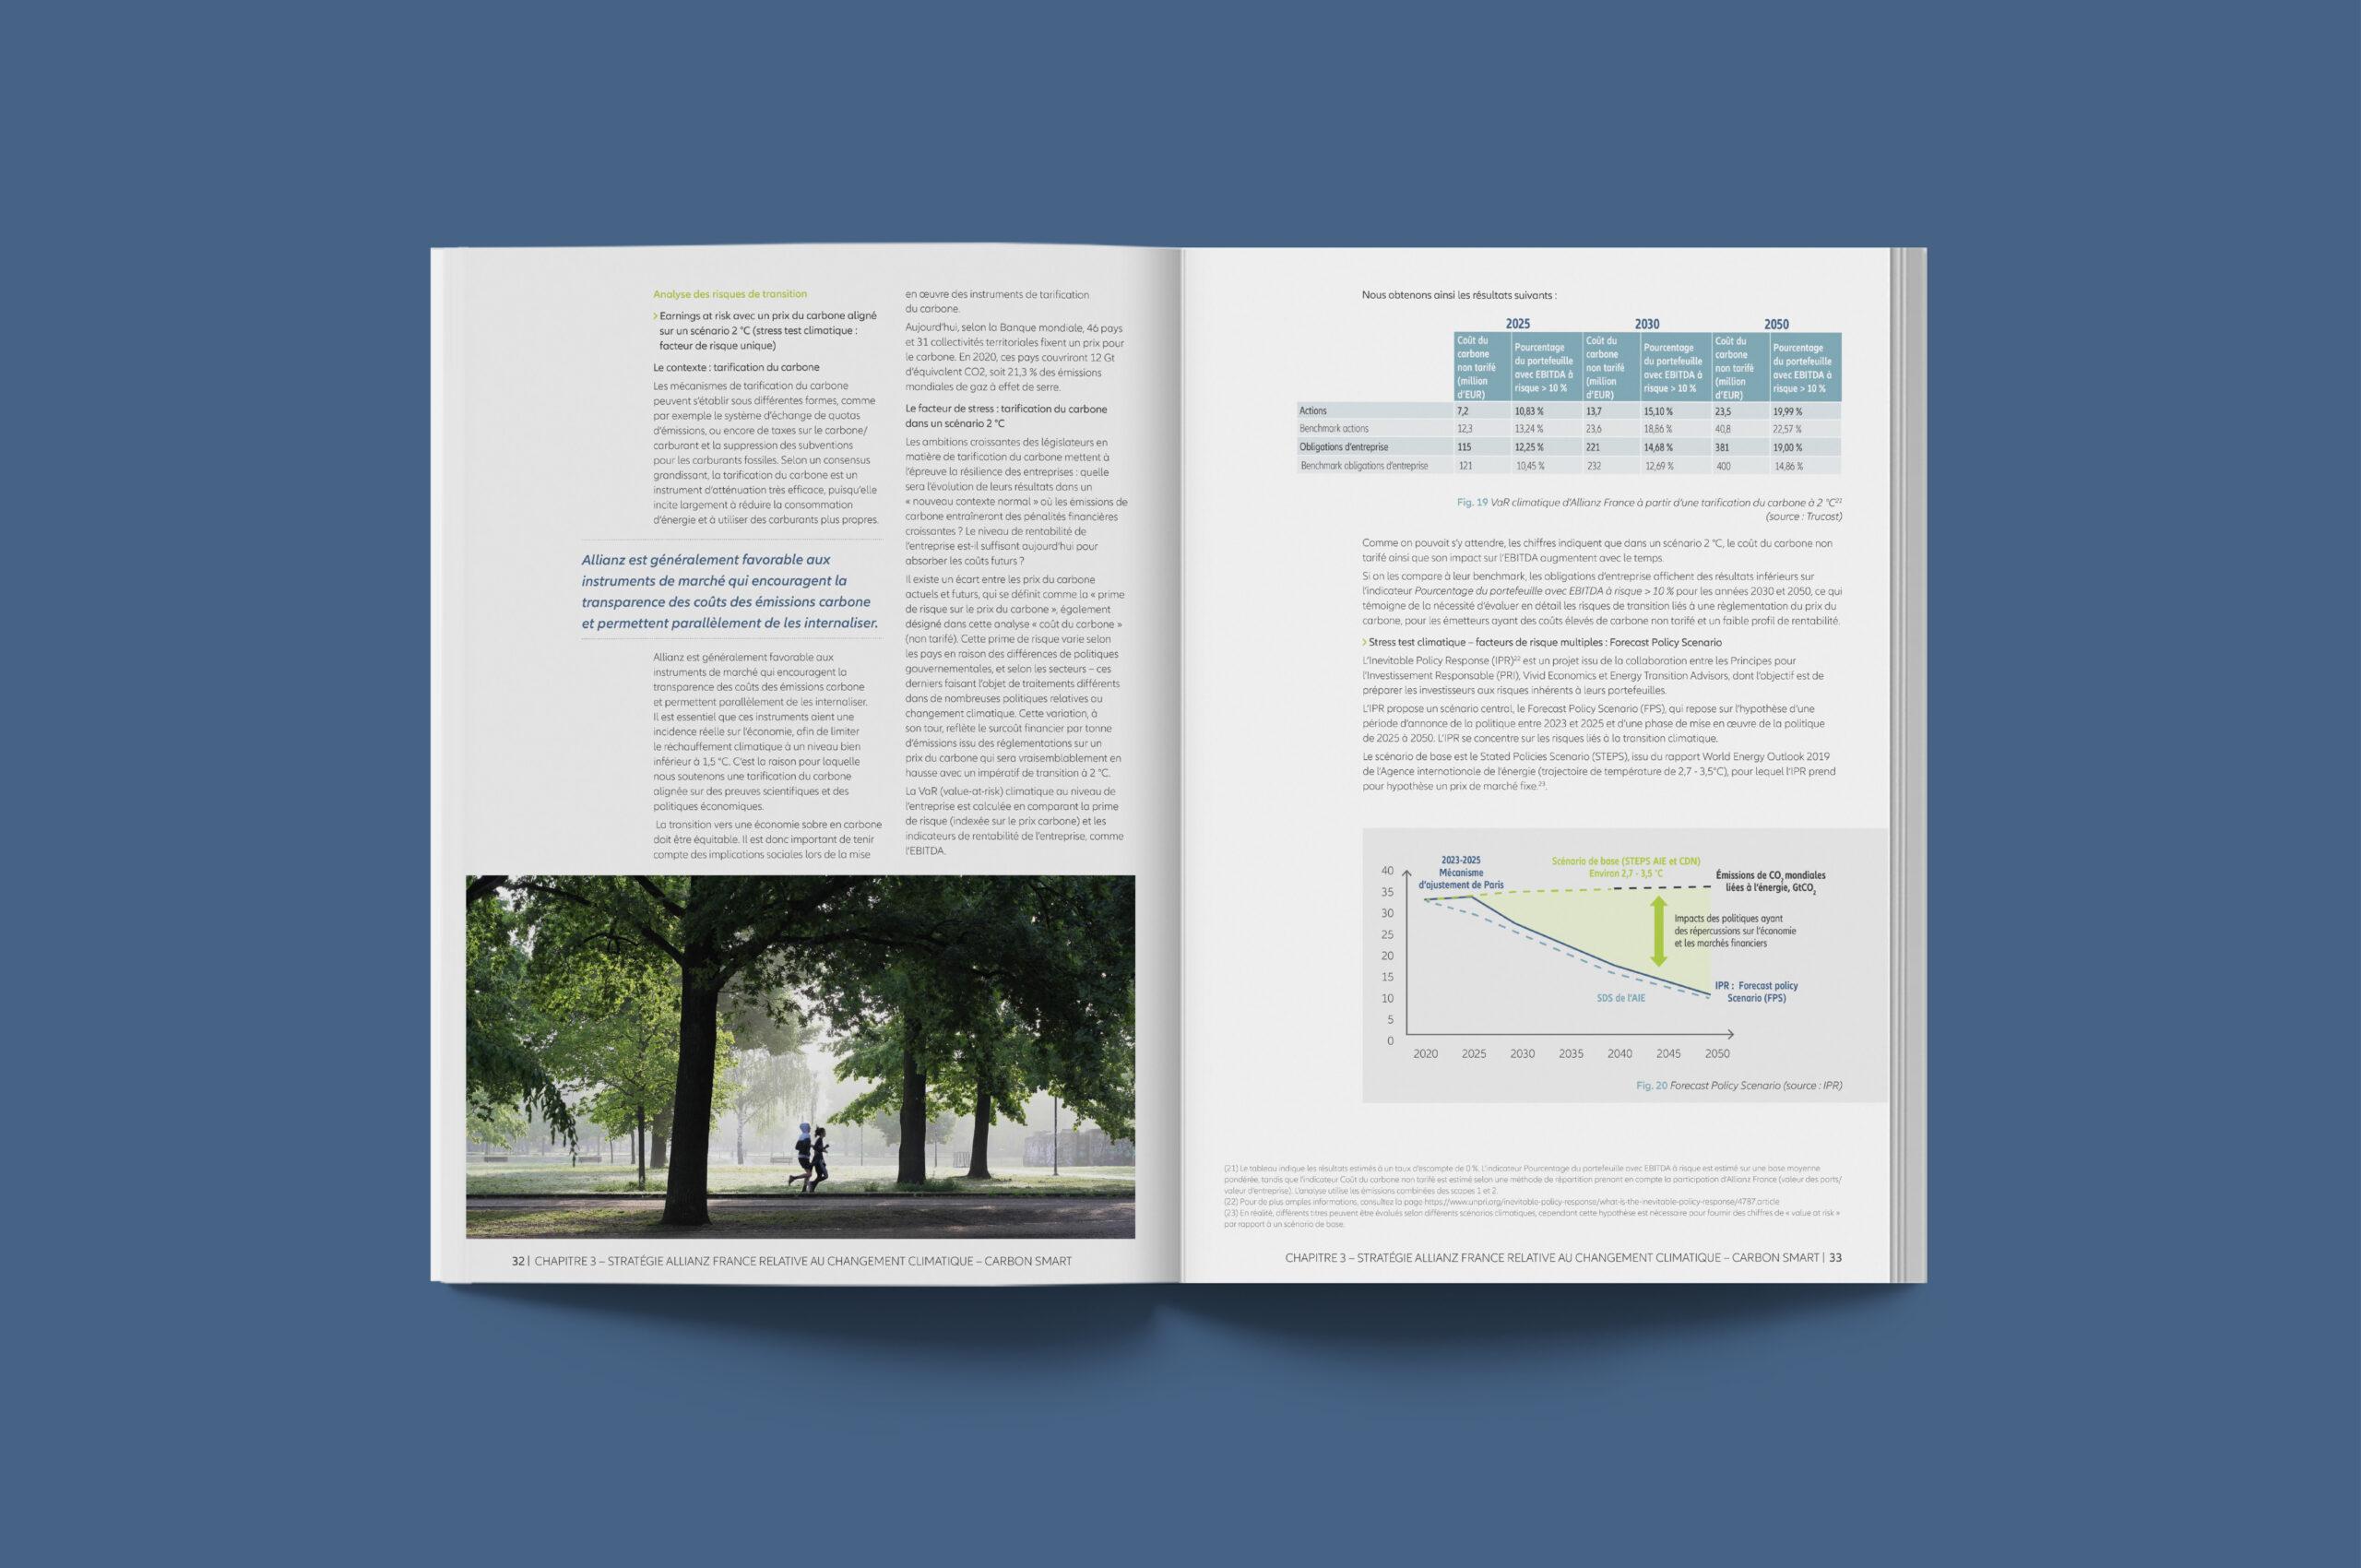 Rapport investissement durable allianz 7